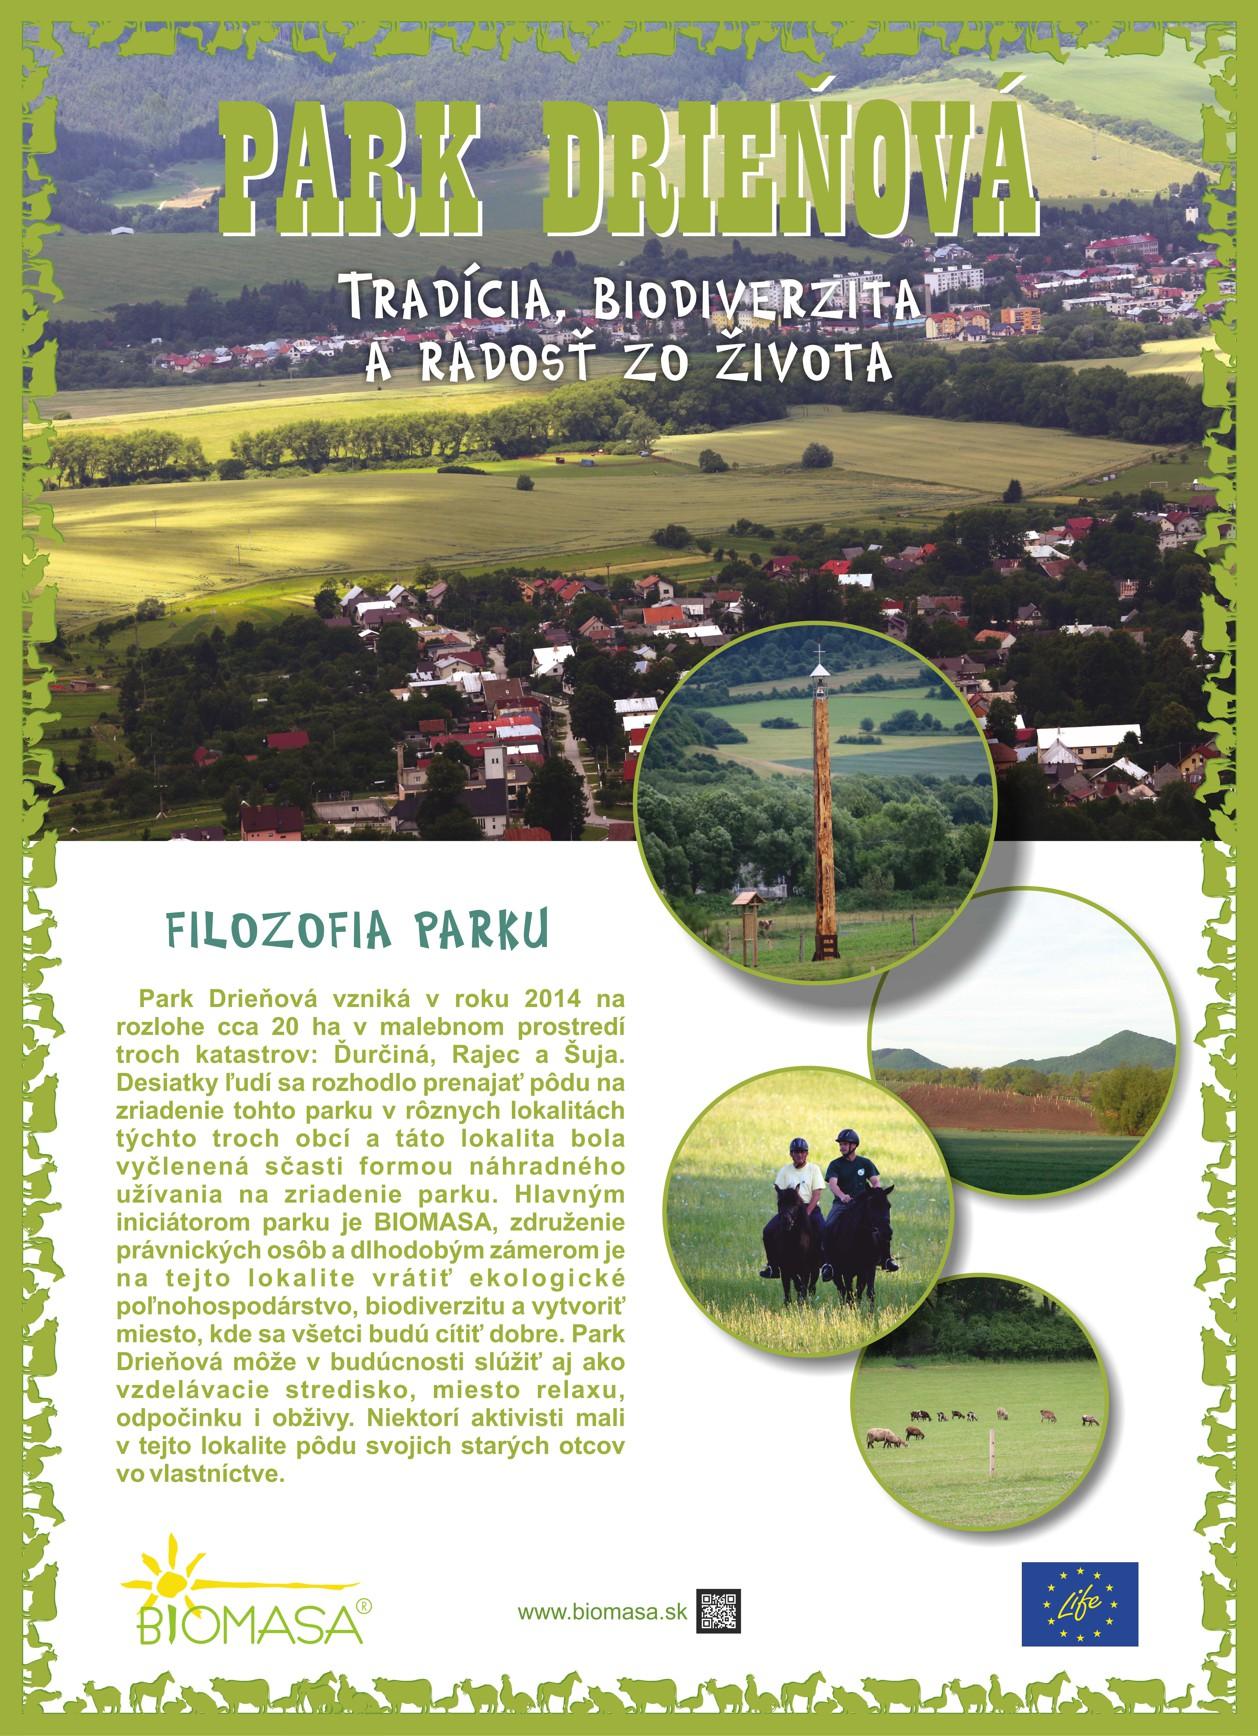 medium-promo-biomasa-park-drienova_panel-1